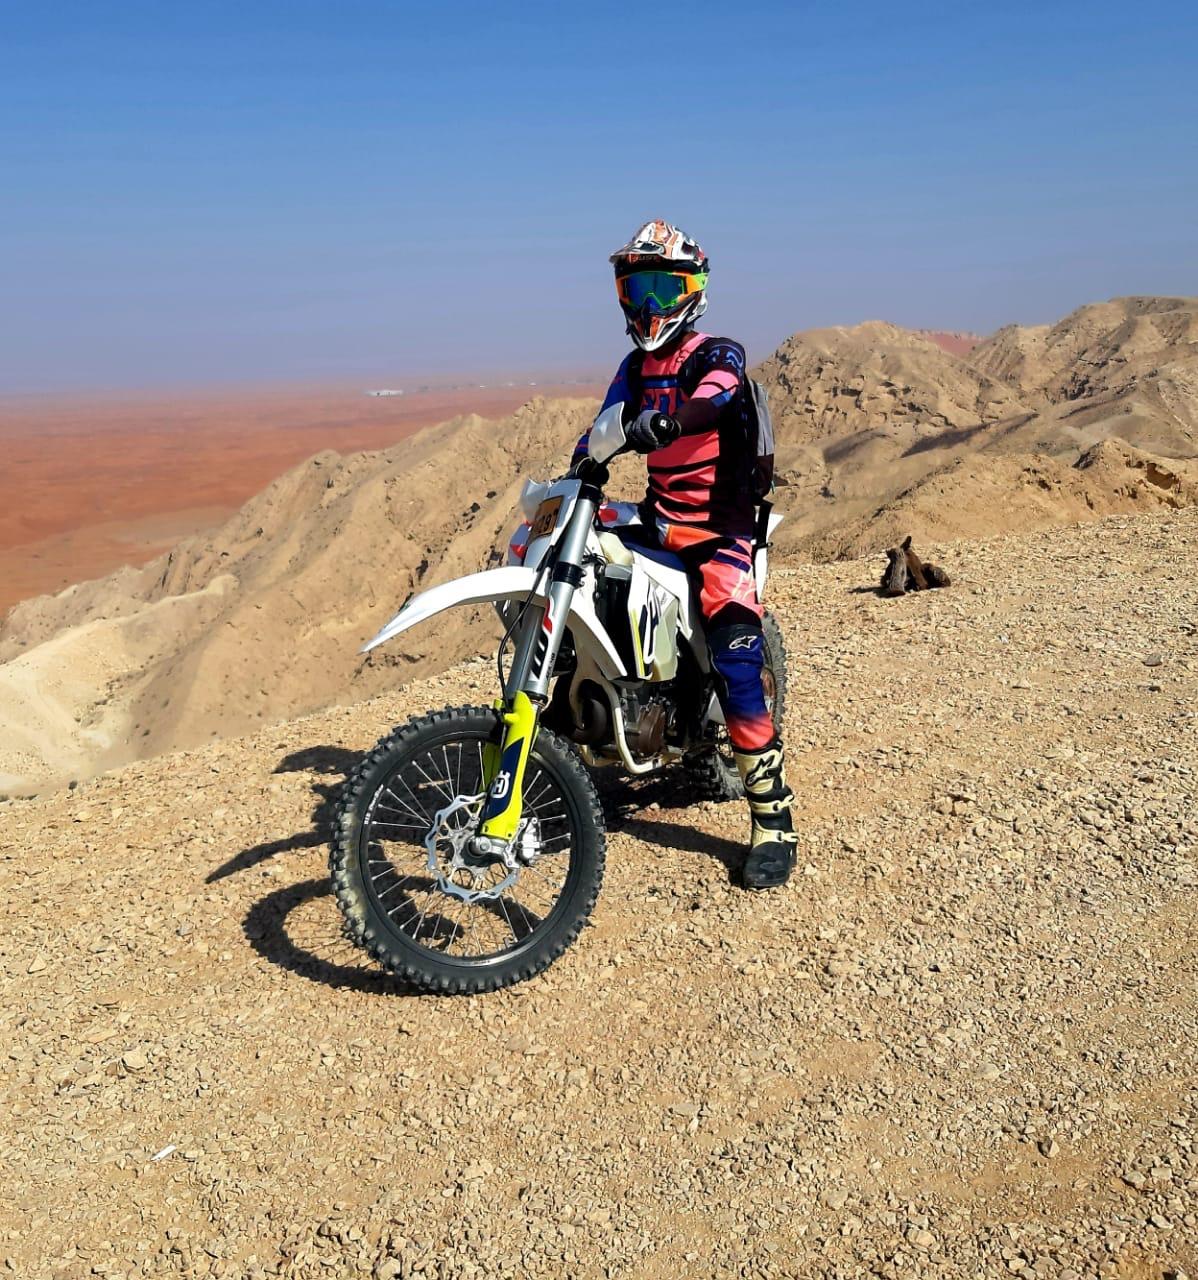 Extreme Rev Motorbike Challenge (4 hours)